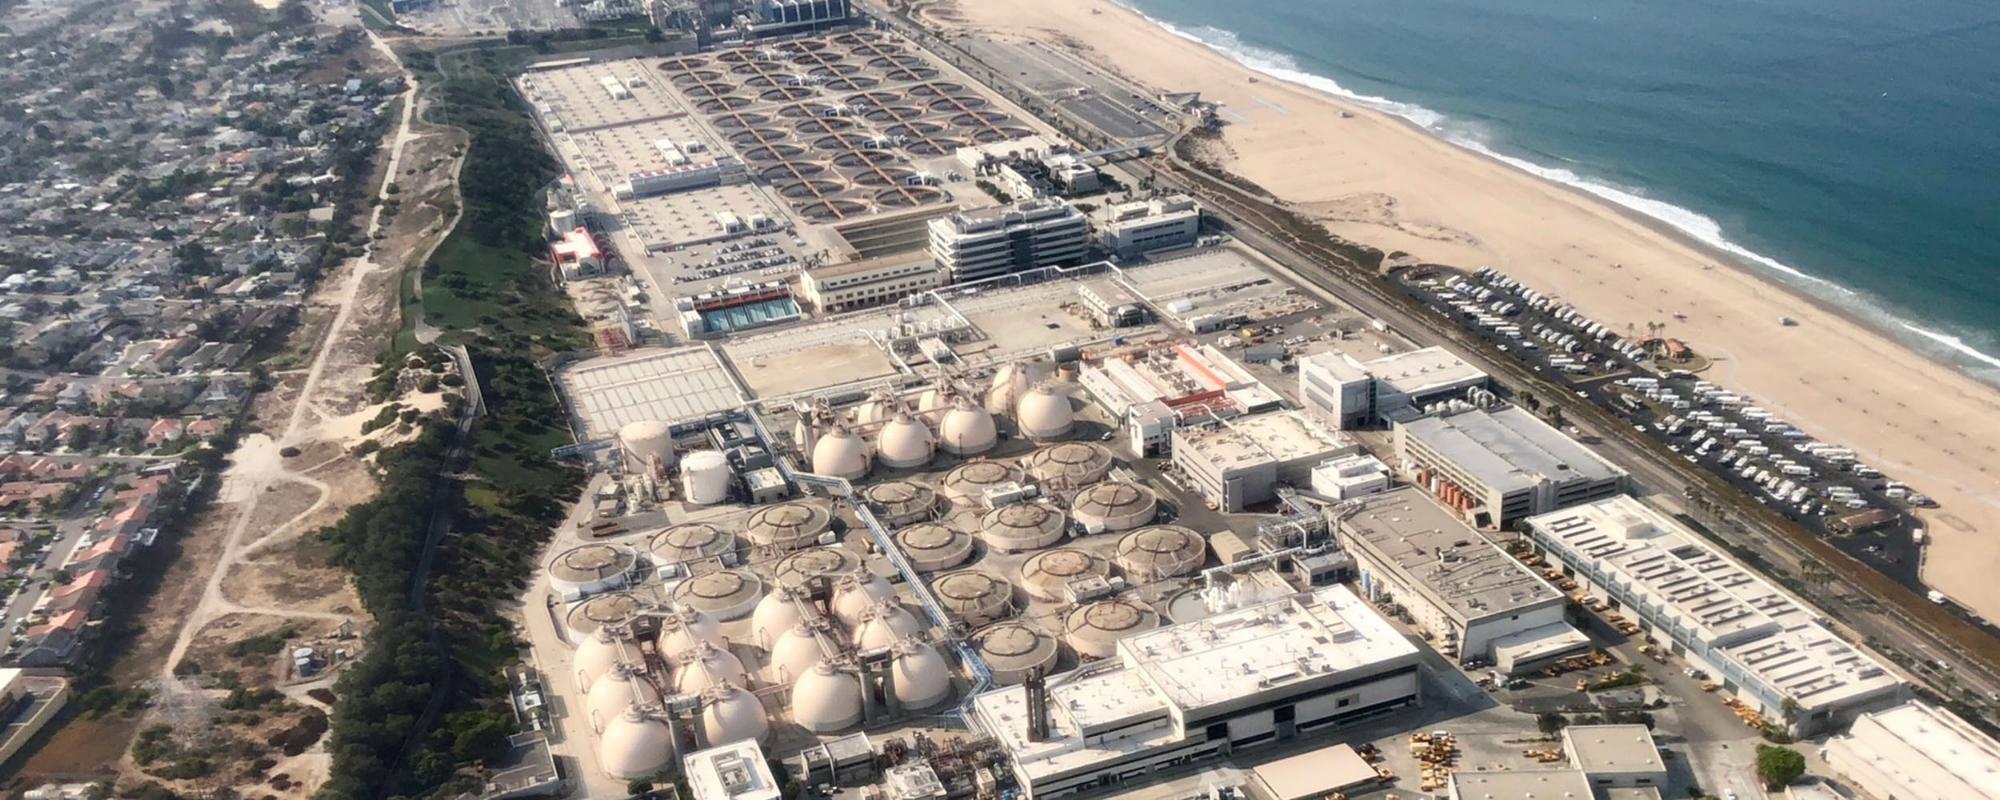 Sewage Treatment Plant Proximity